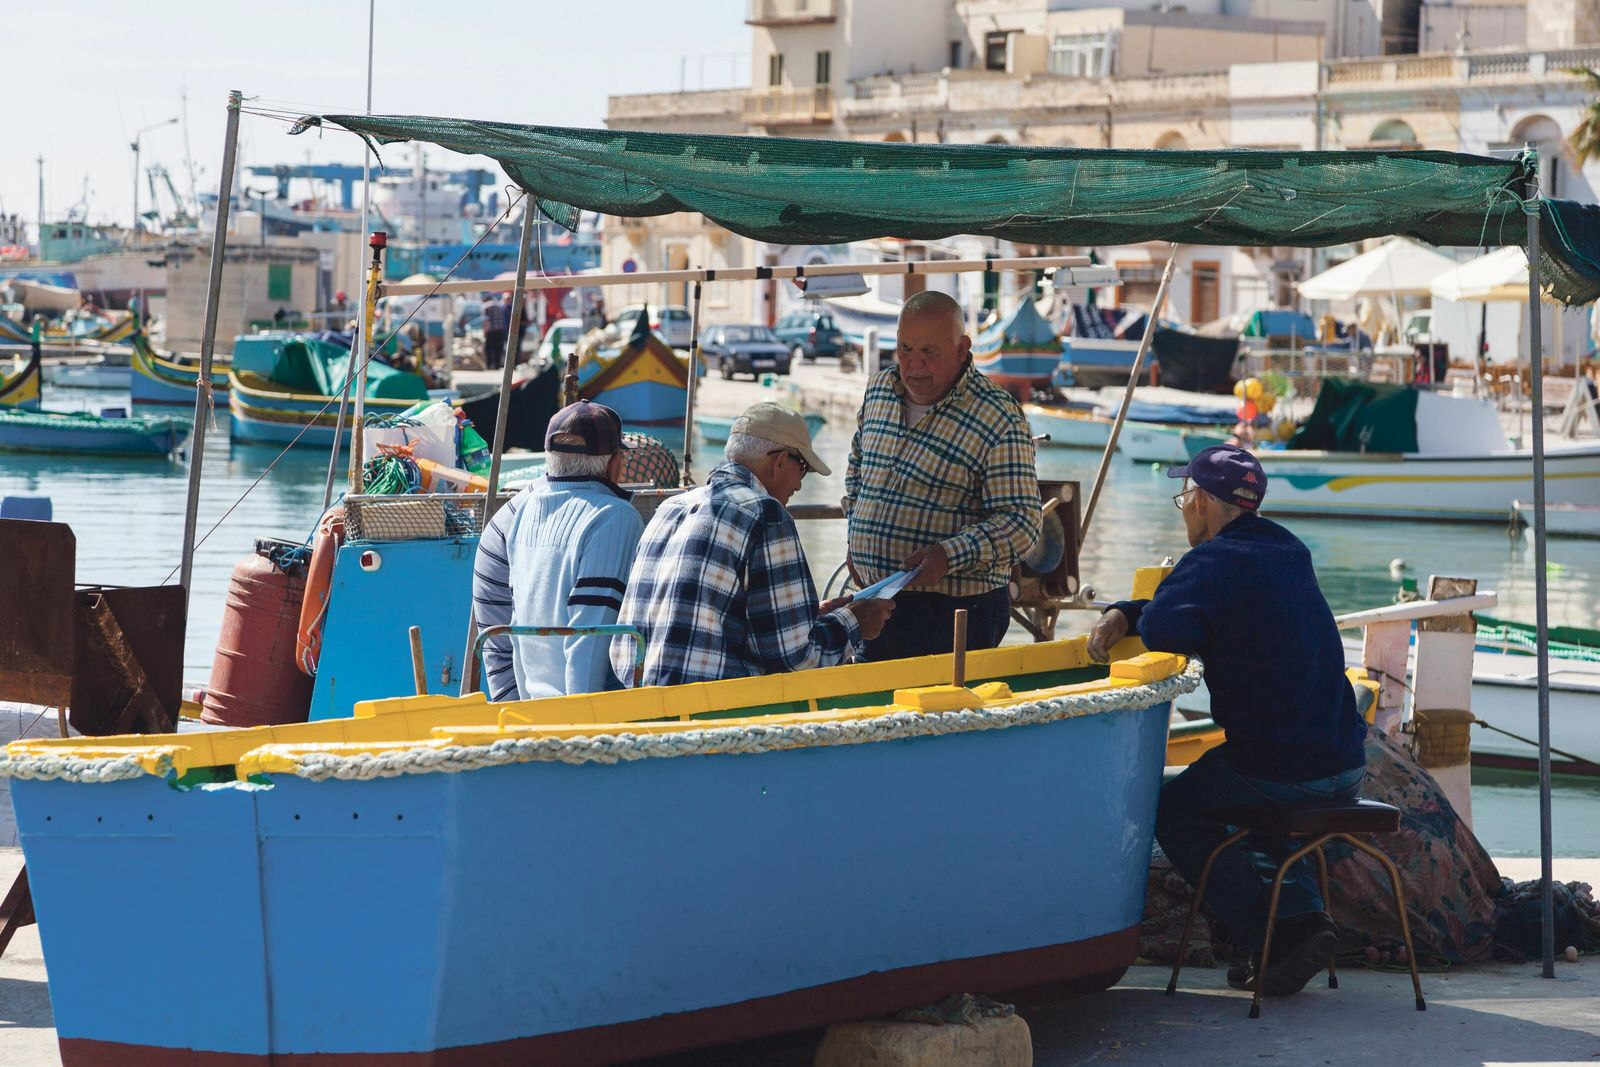 Traditional fishing boats line up in the fishing village, Marsaxlokk.